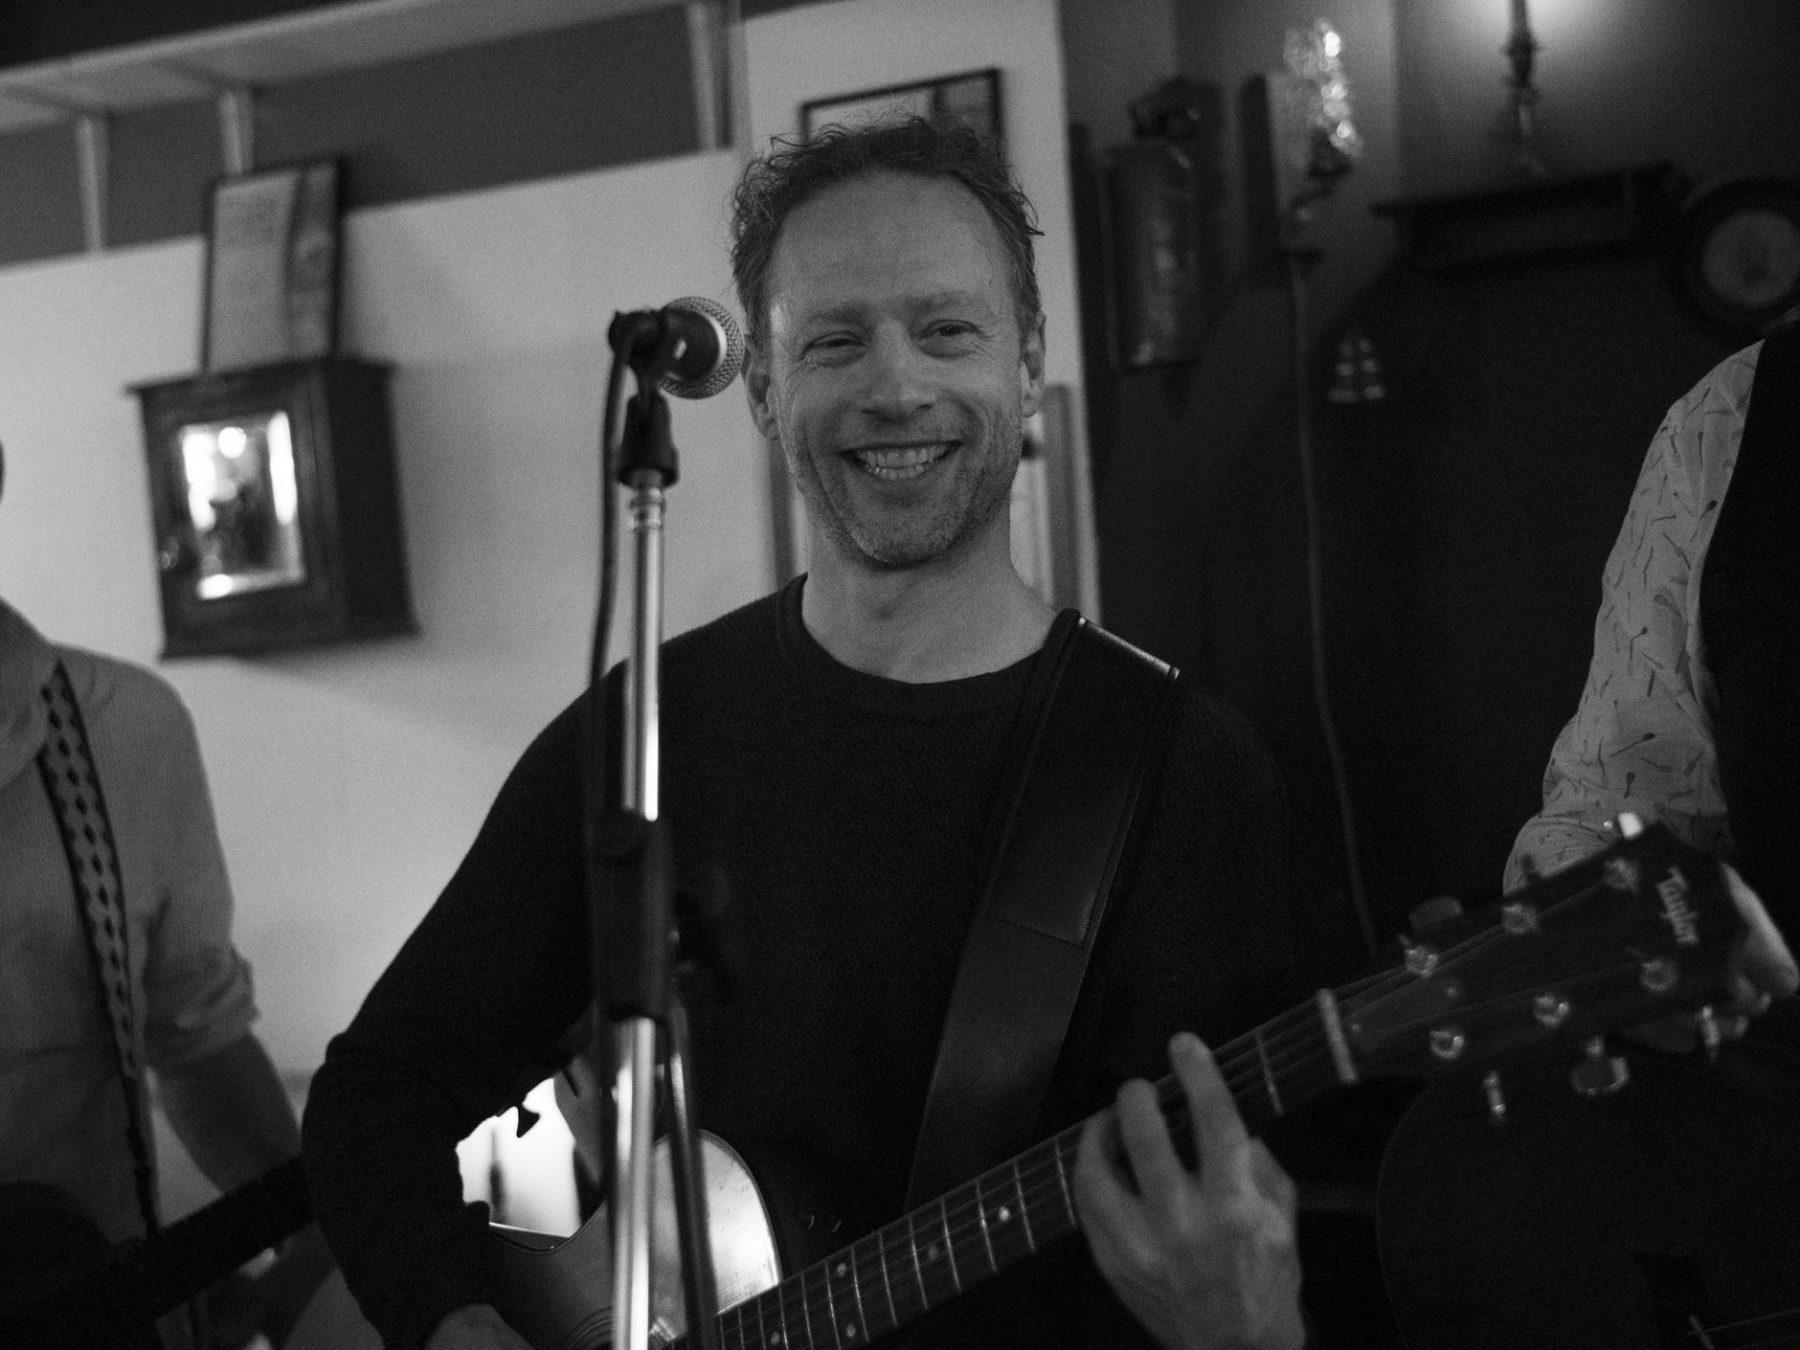 Stort smilende Olav Frølich fra Hund i Snor